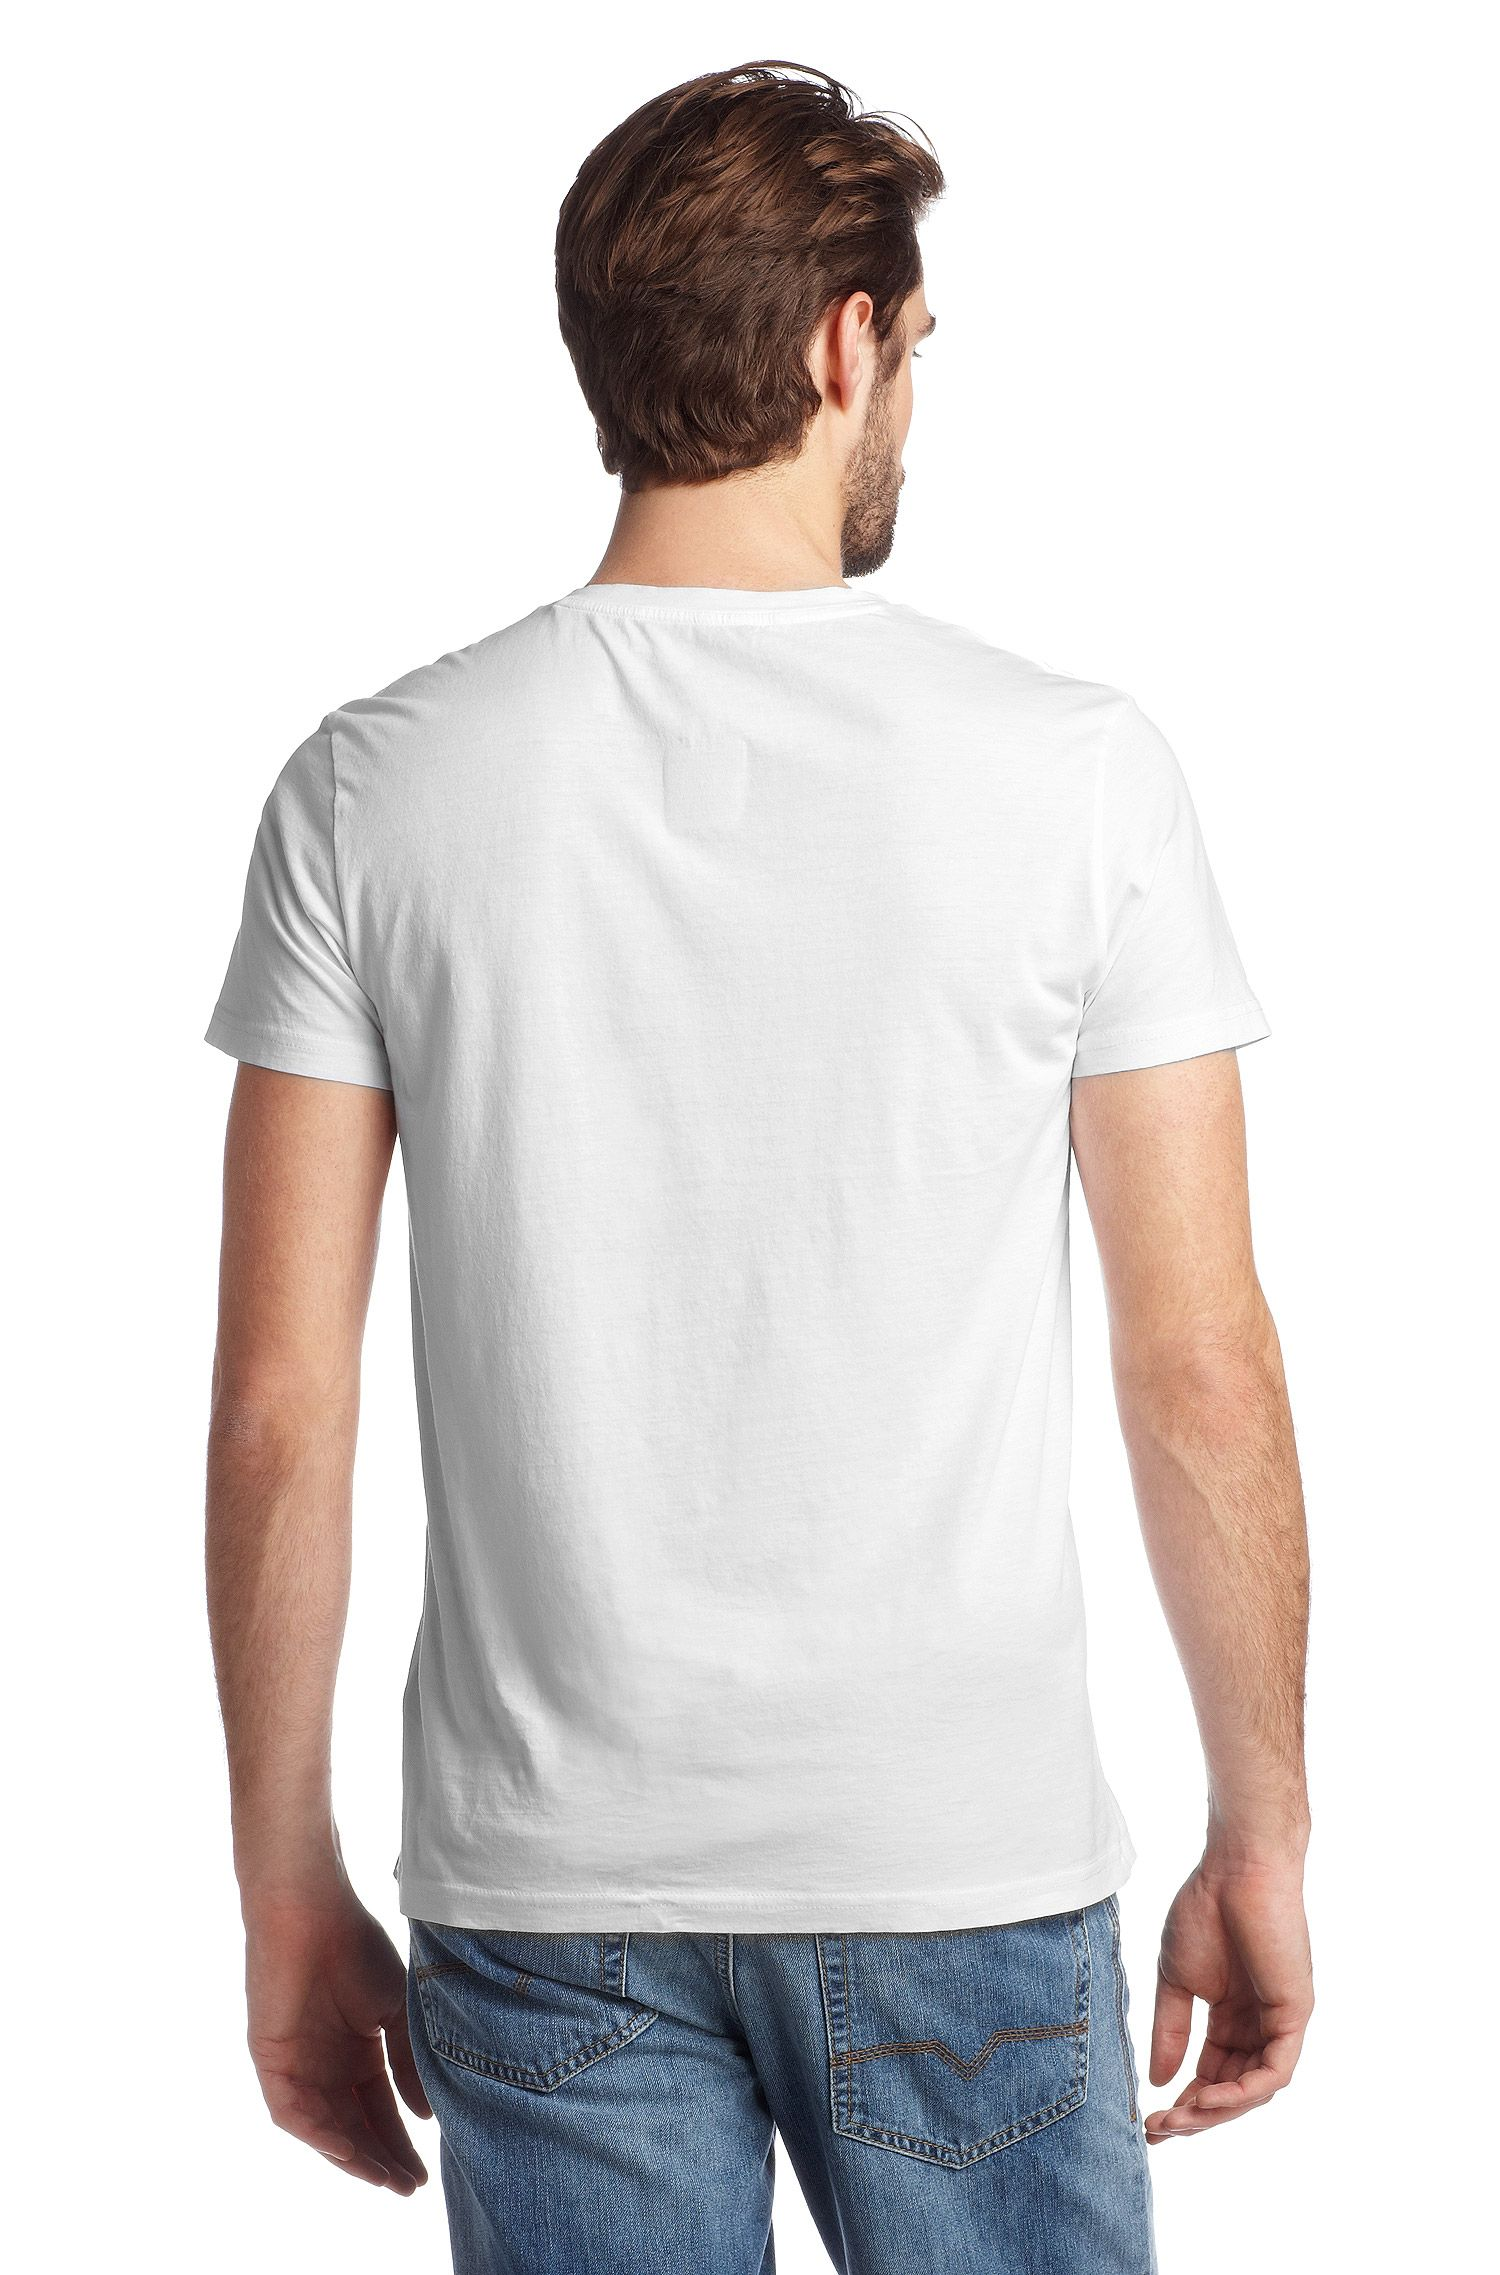 T-shirt à encolure en V, Tryon